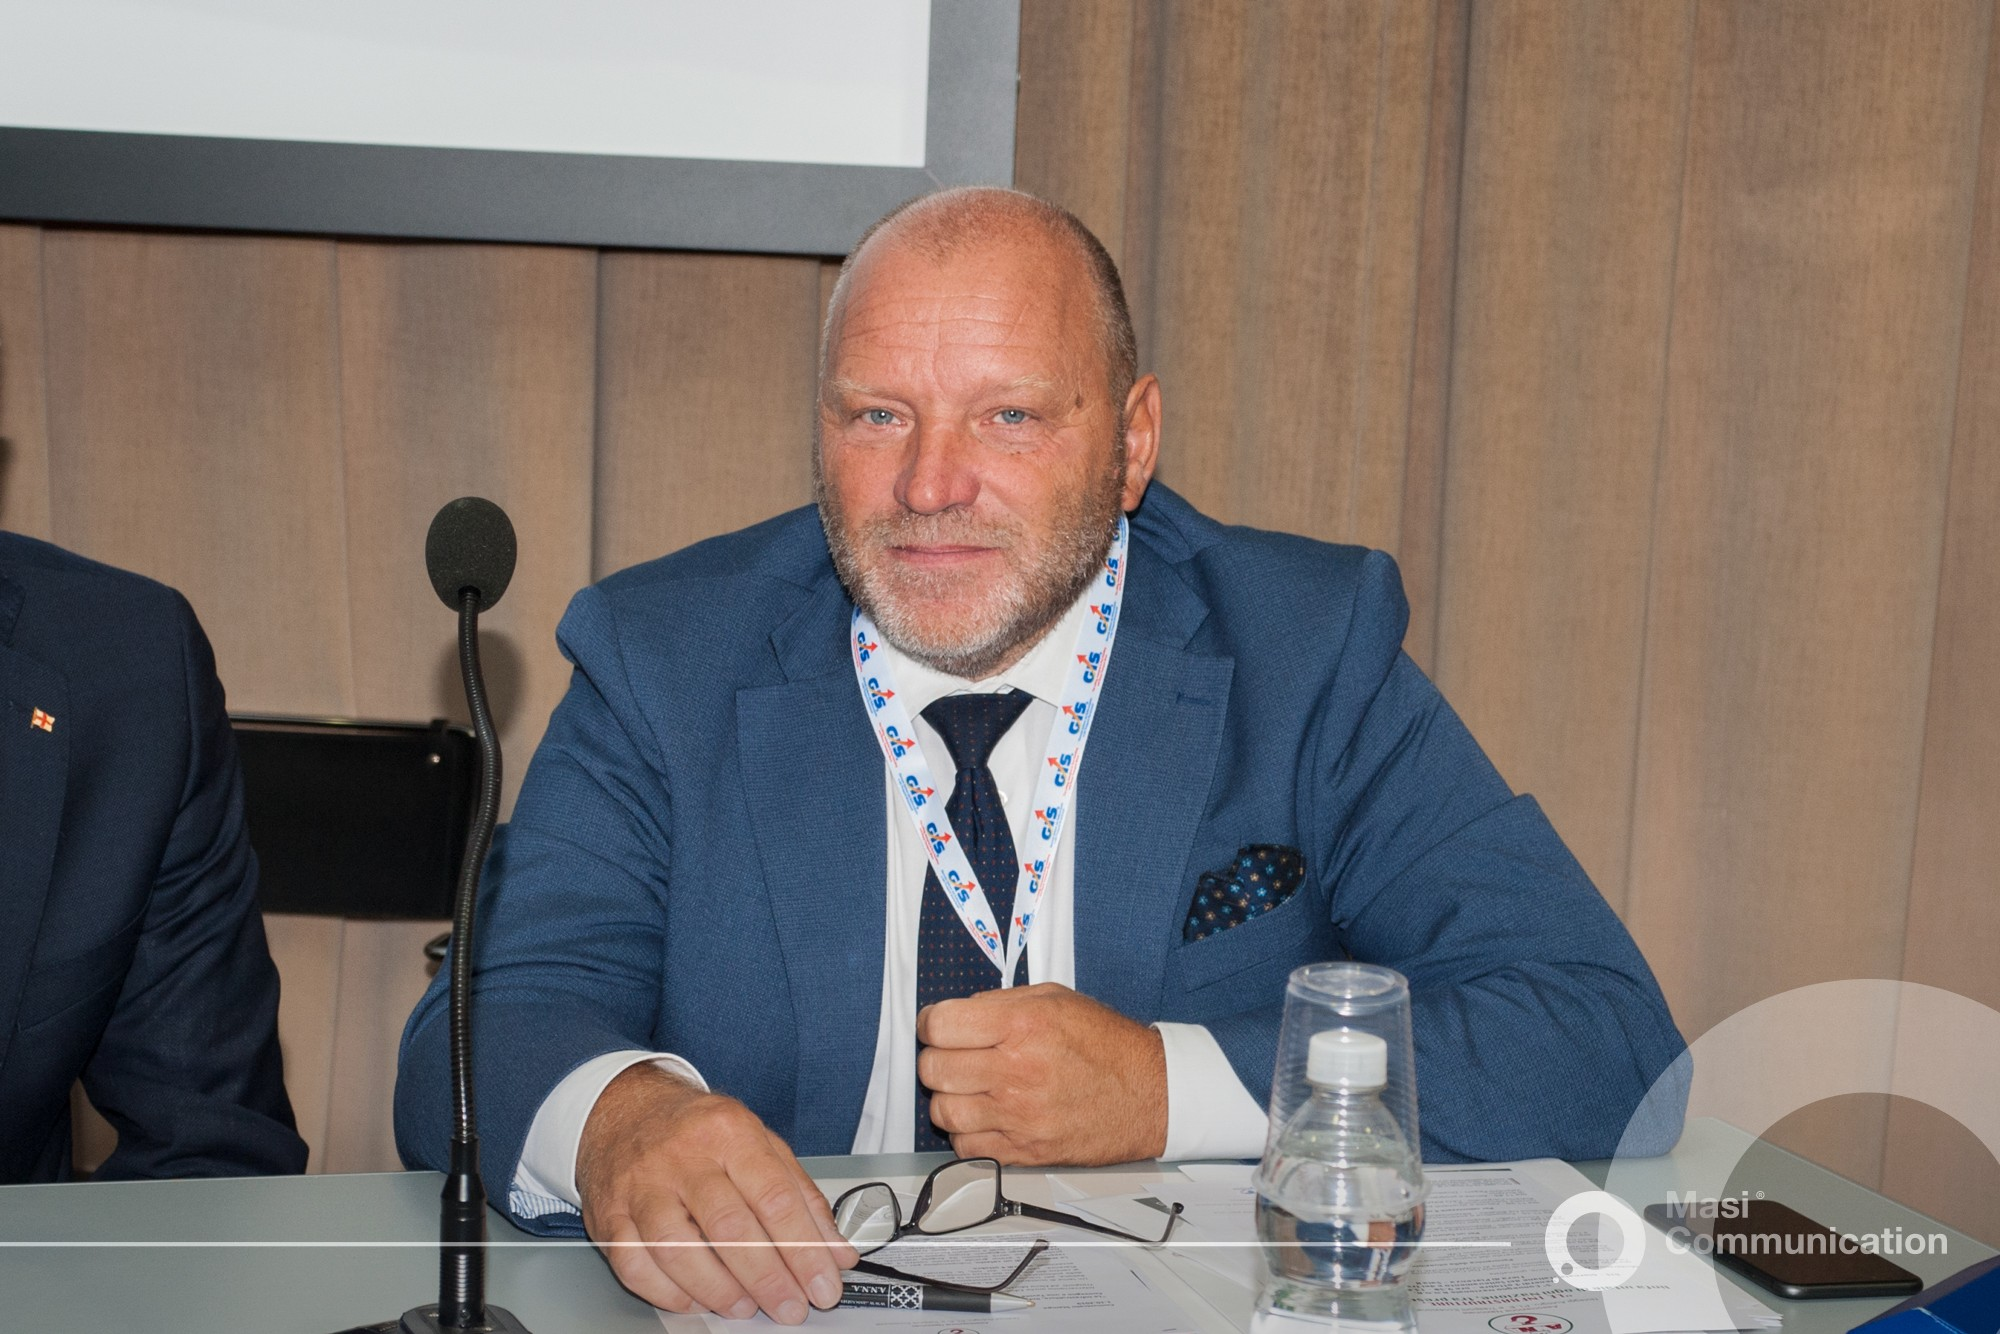 Roberto Carpaneto, CEO RINA Consulting